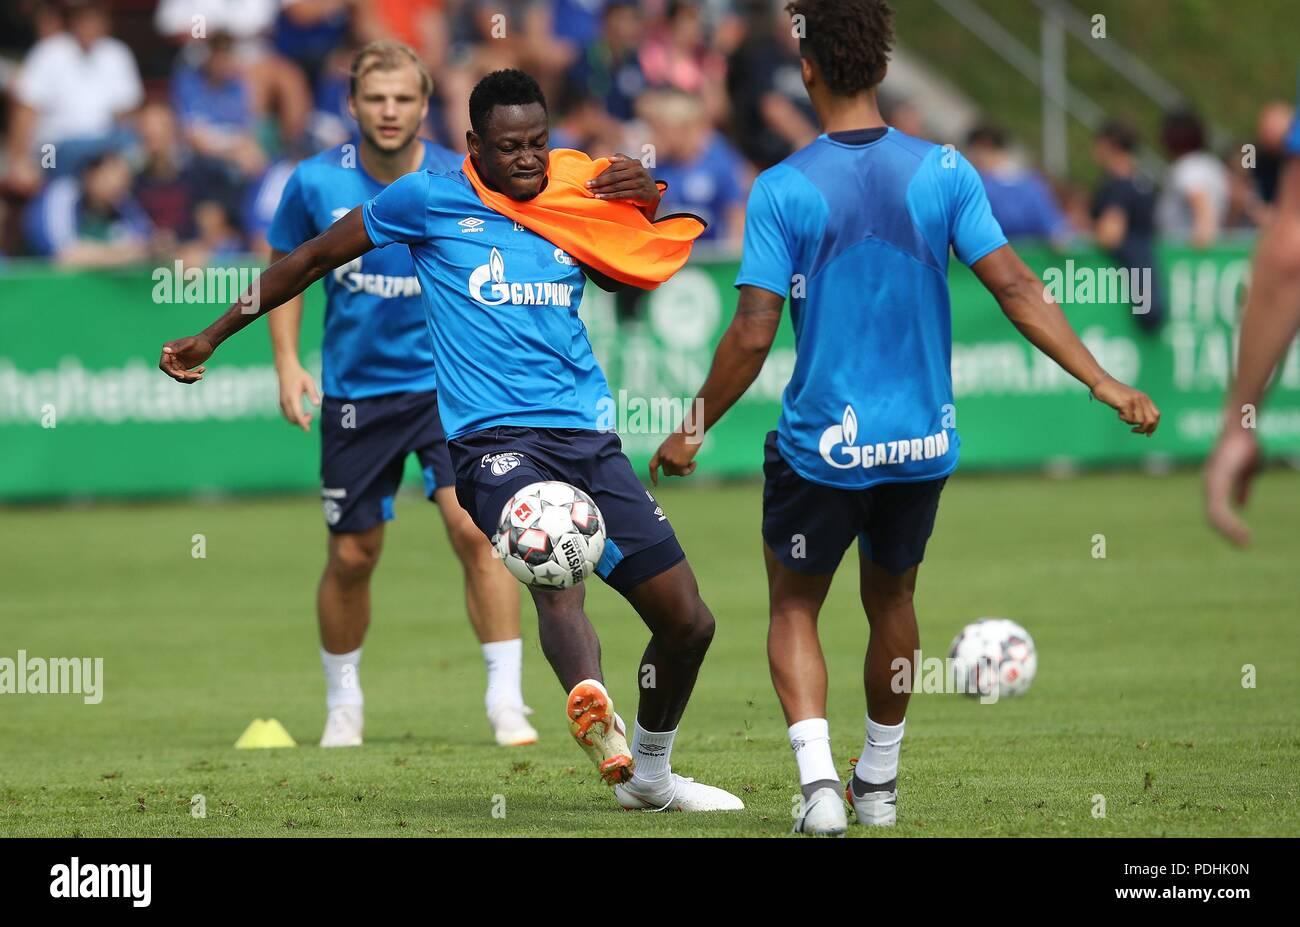 firo football, football, 03.08.2018 1st Bundesliga, season 2018/2019 Training in with fast training FC Schalke 04 Baba   usage worldwide - Stock Image